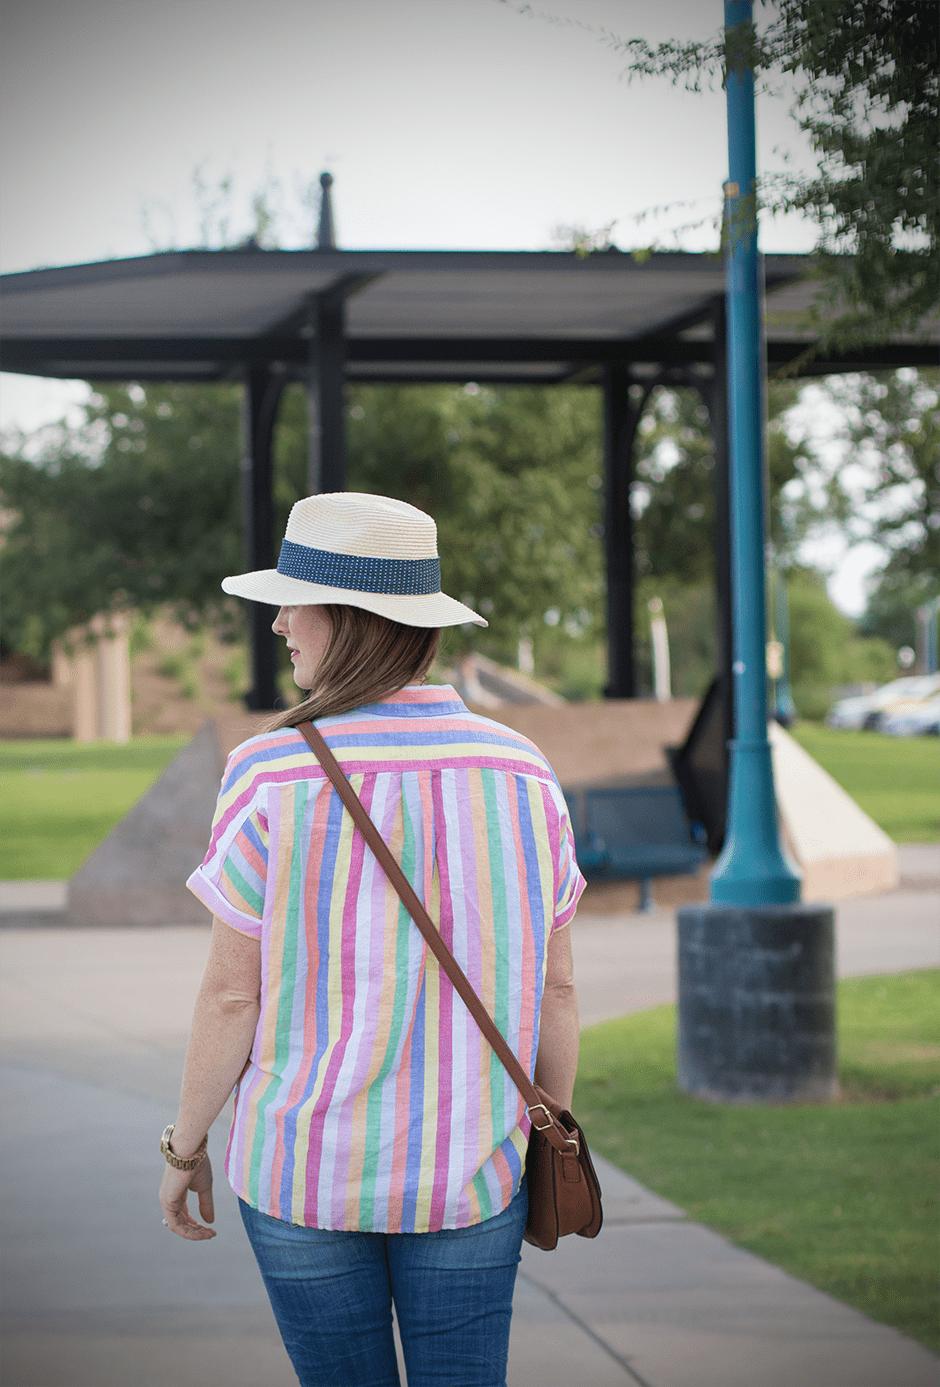 saddlebag-purse-errand-style